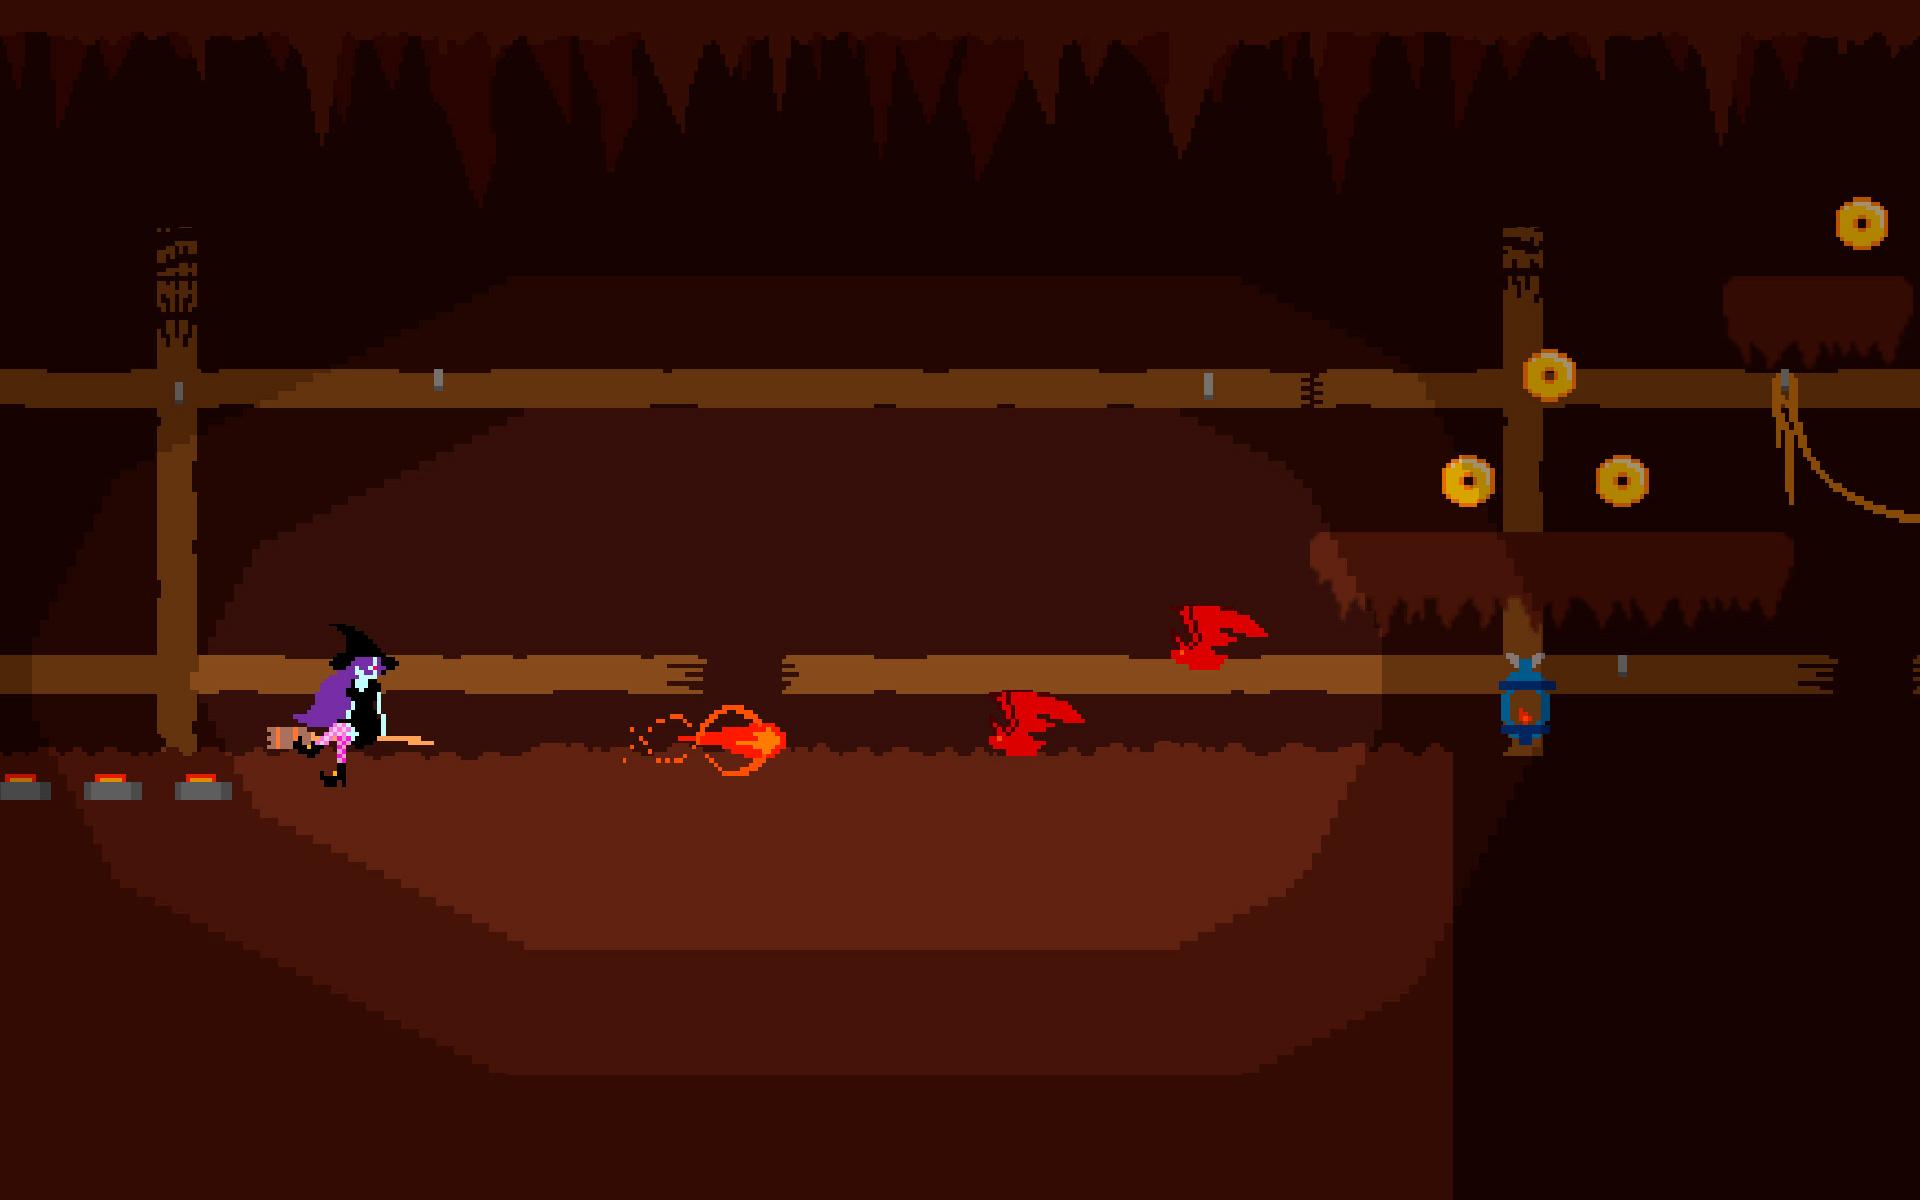 Imagem ilustrativa do jogo